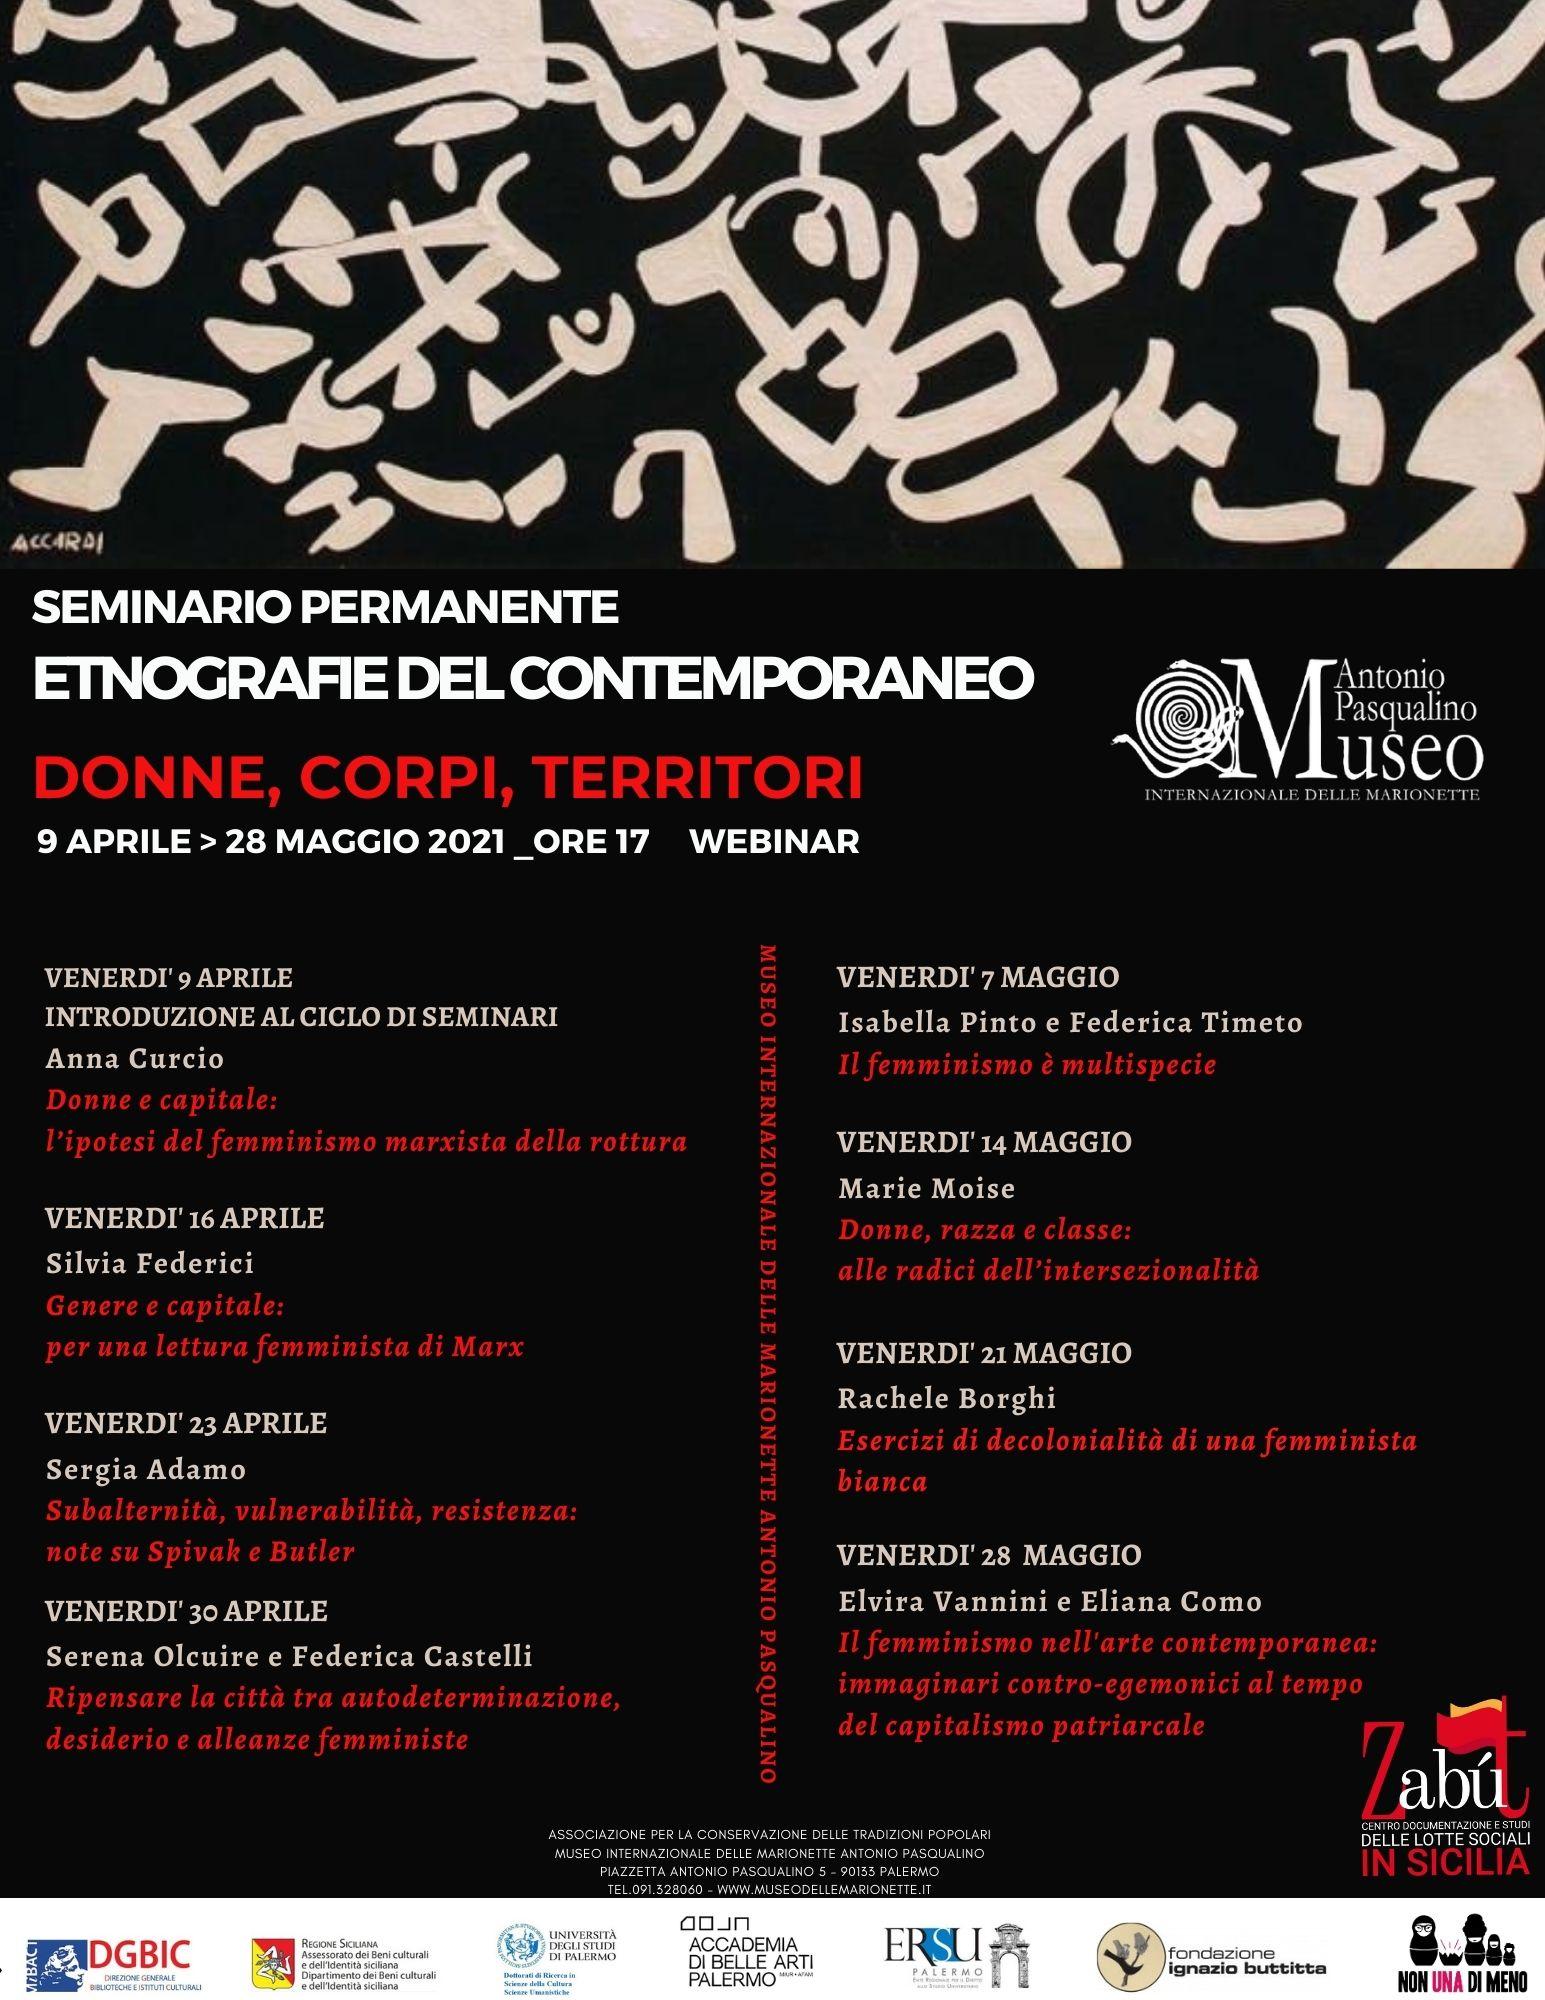 Ciclo_di_Seminari_Etnografie_del_contemporaneo_2.jpg - 374.48 kB